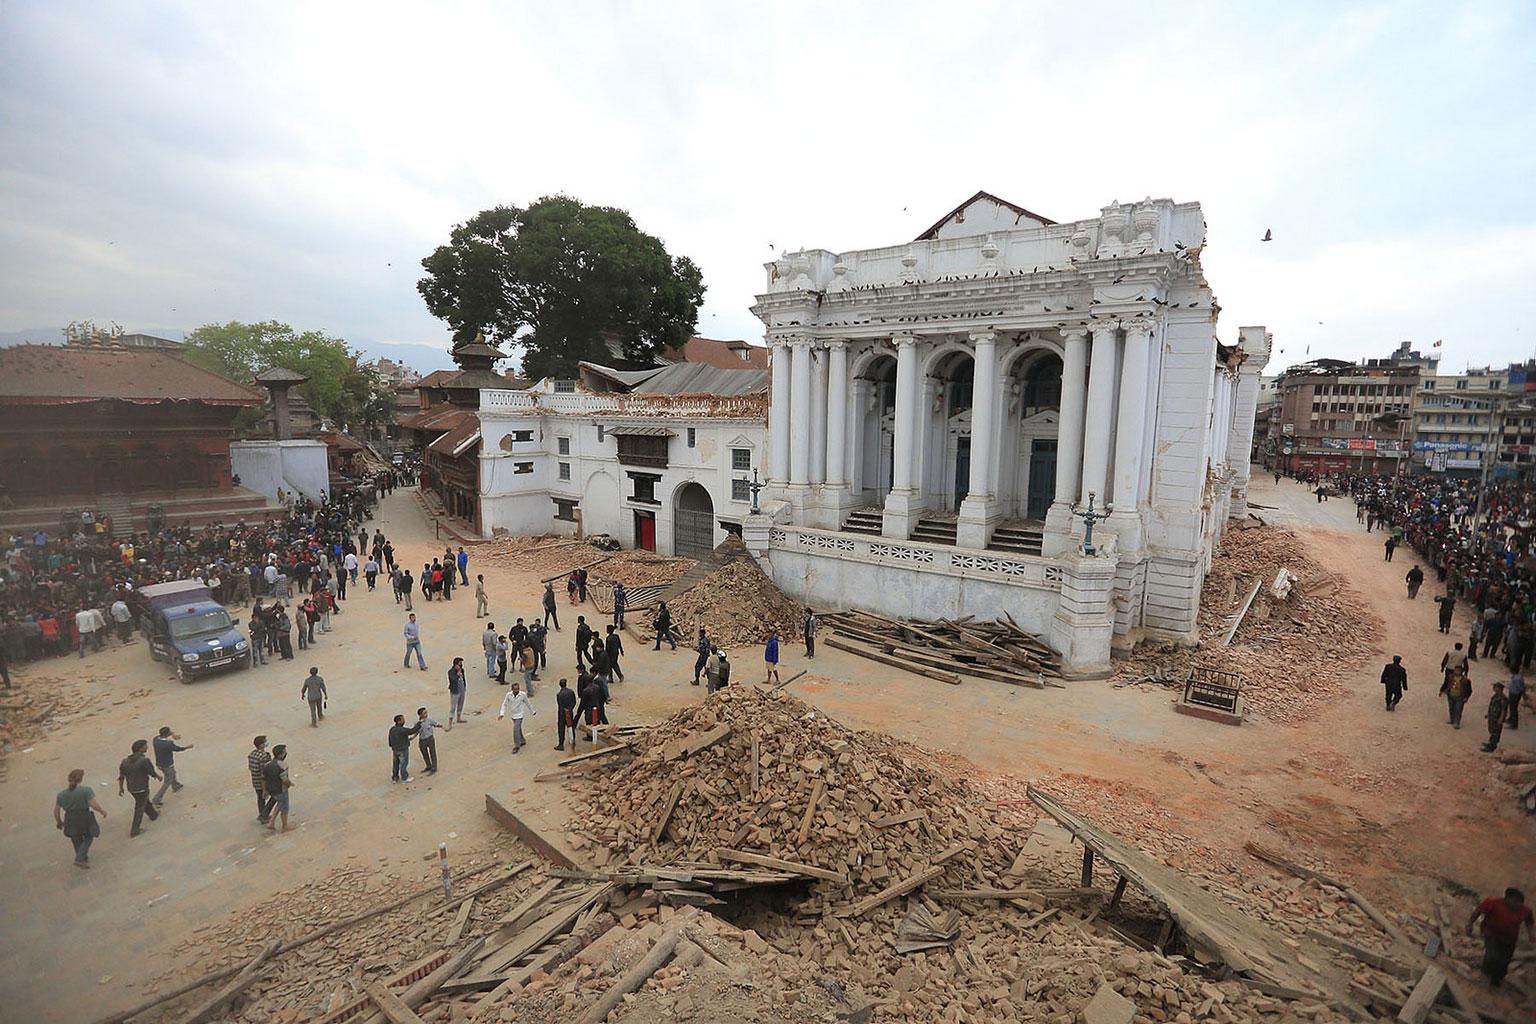 Photograph by Laxmi Prasad Ngakhusi/UNDP Nepal